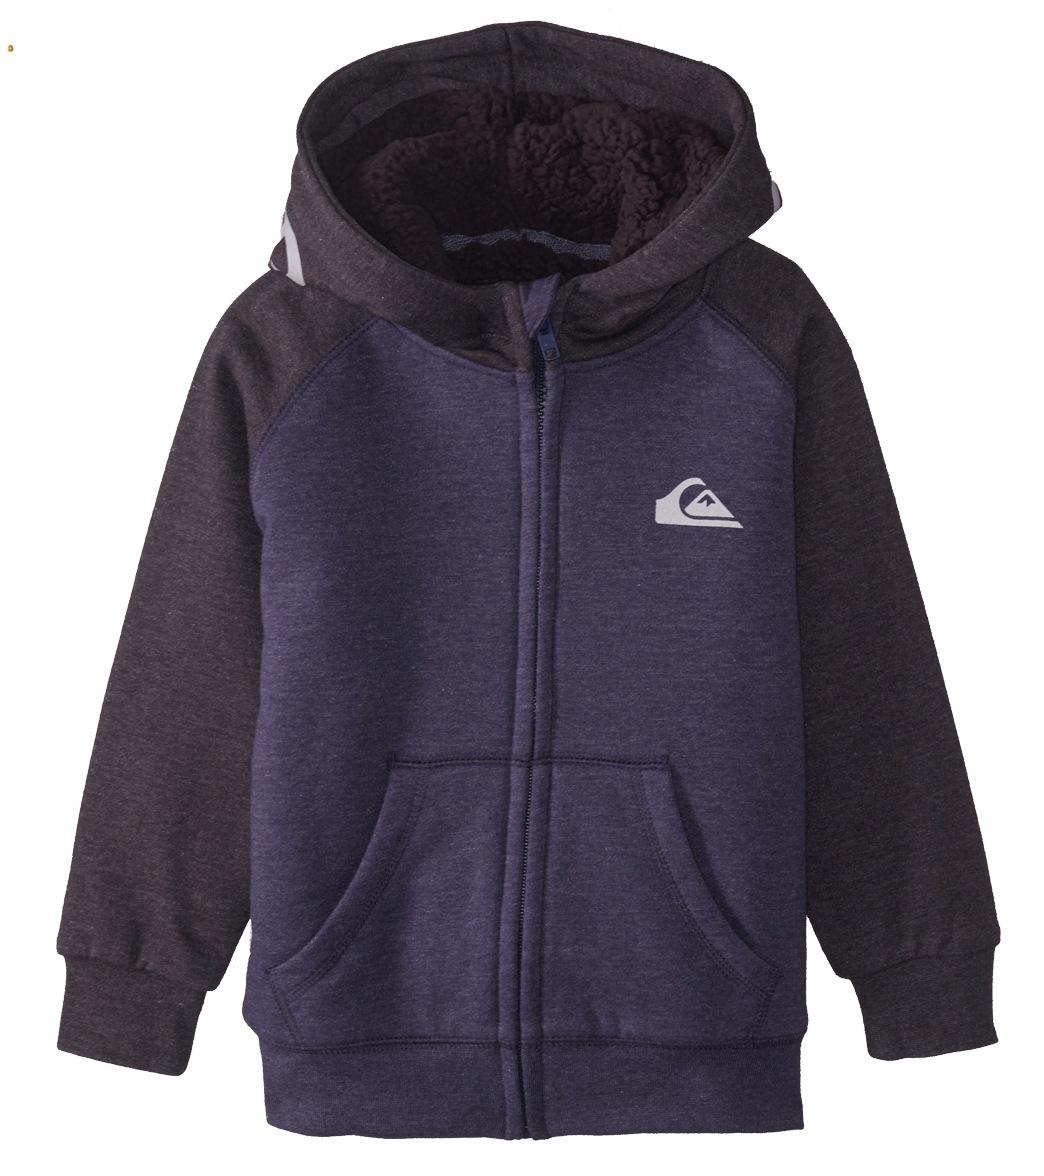 40ee43a64cb Quiksilver Boys  Juwa Sherpa Zip Hoodie (Little Kid) at SwimOutlet.com -  Free Shipping